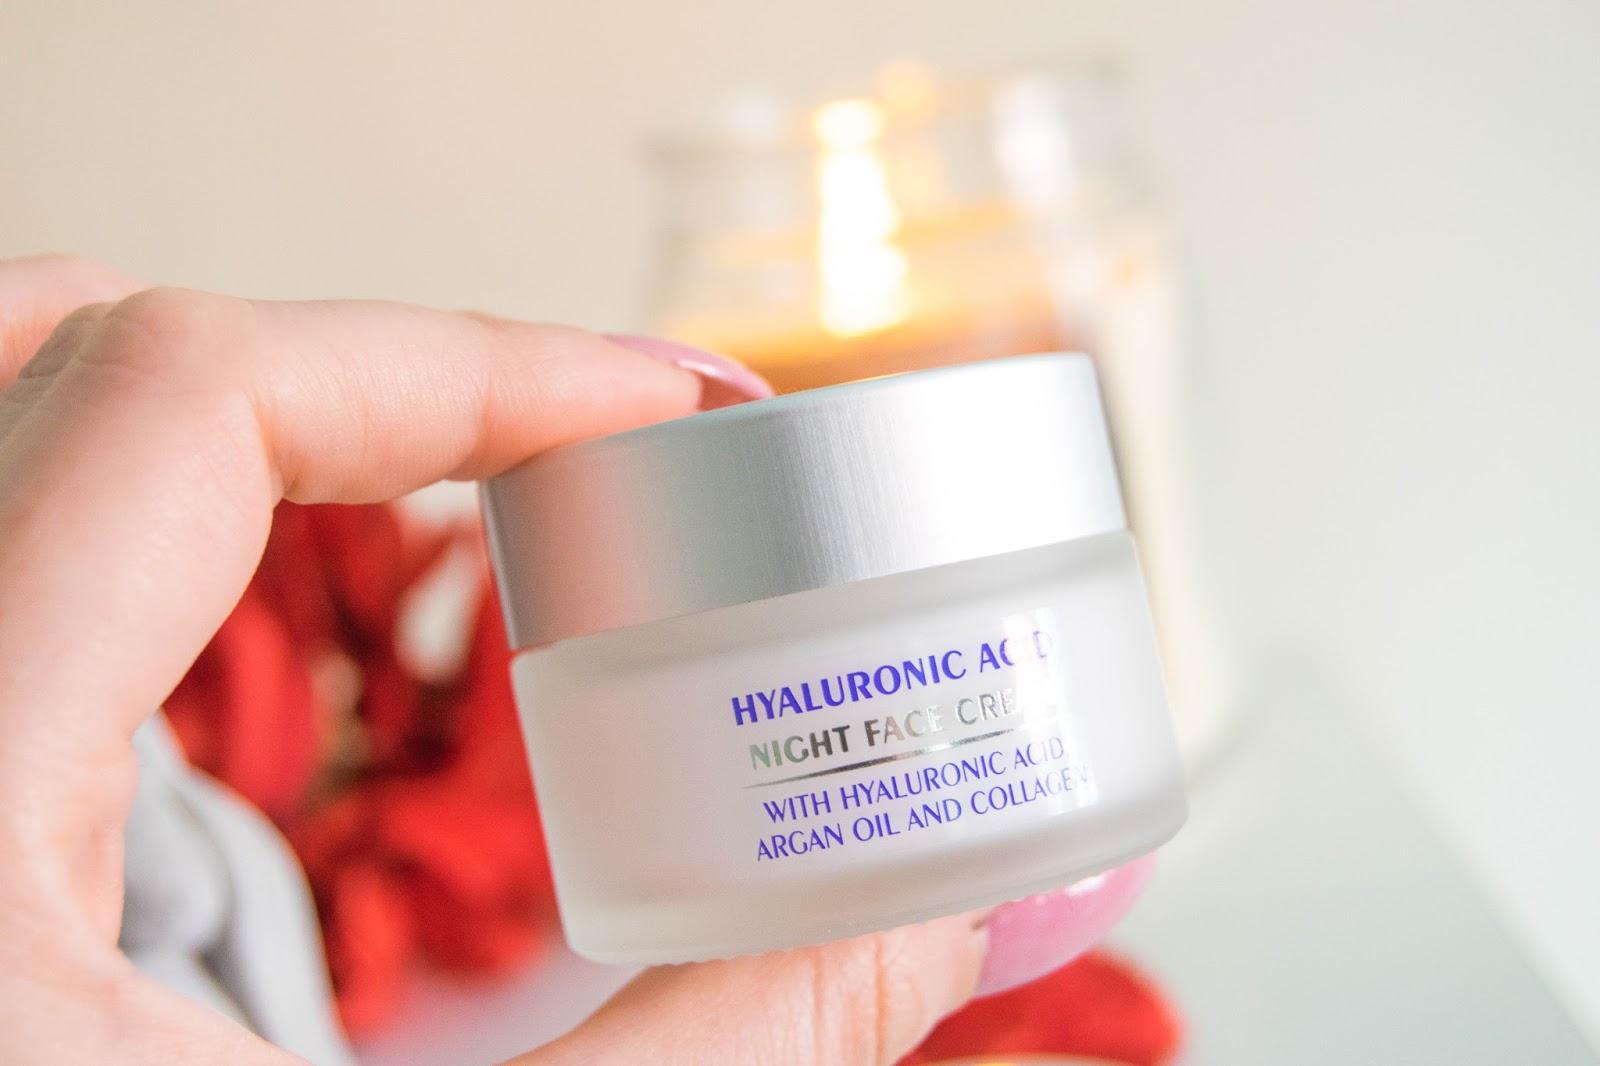 refan ácido hialurónico